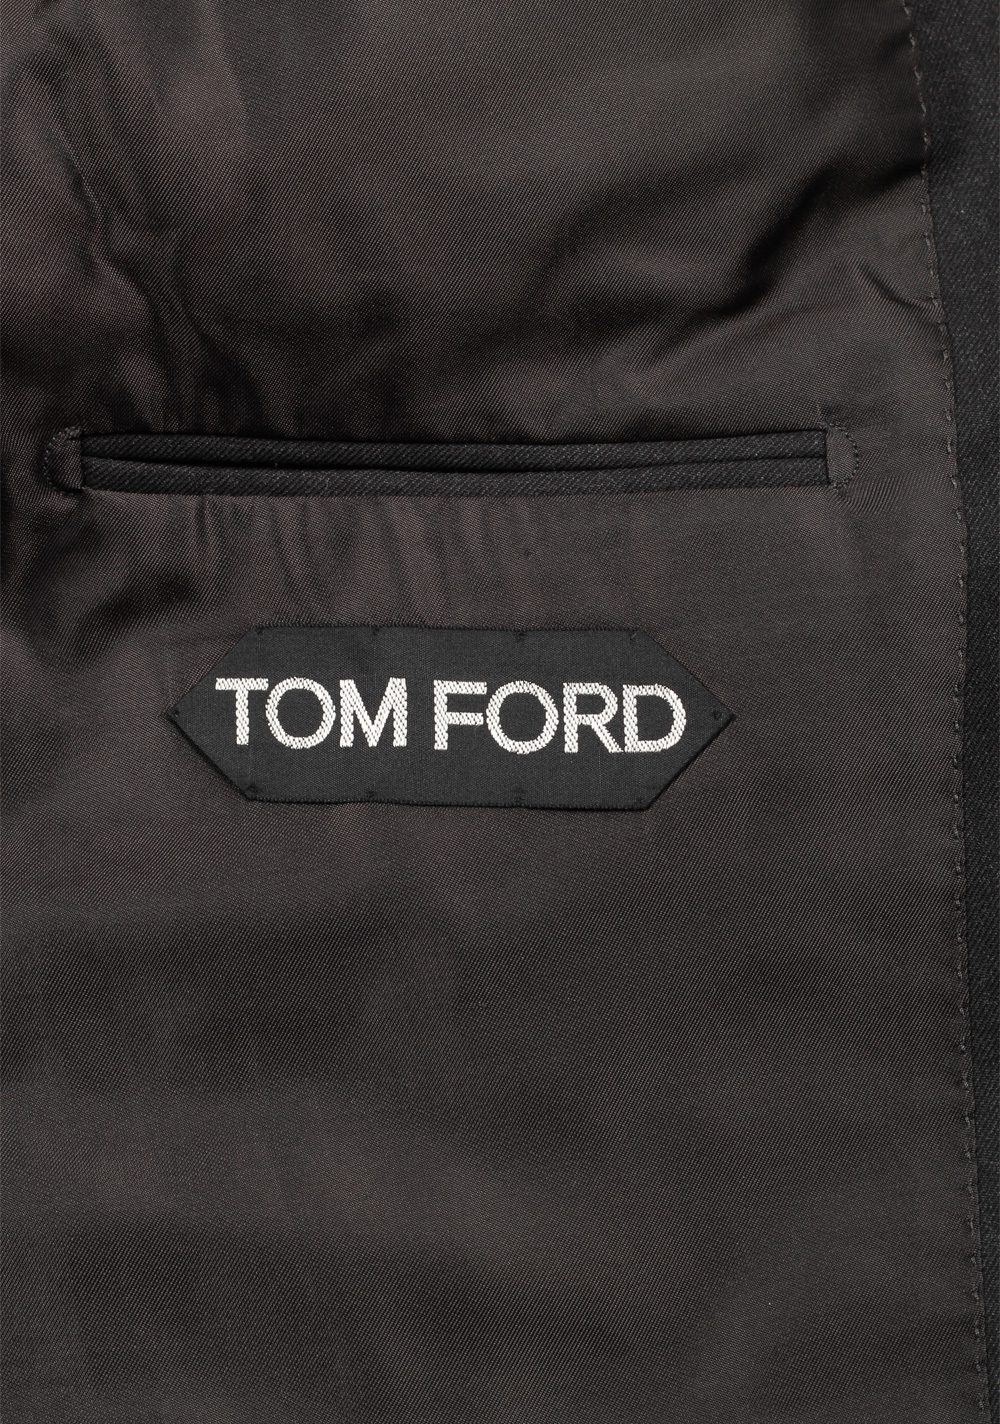 TOM FORD Regency Gray Suit 3 Piece Size 44 / 34R U.S. Wool   Costume Limité